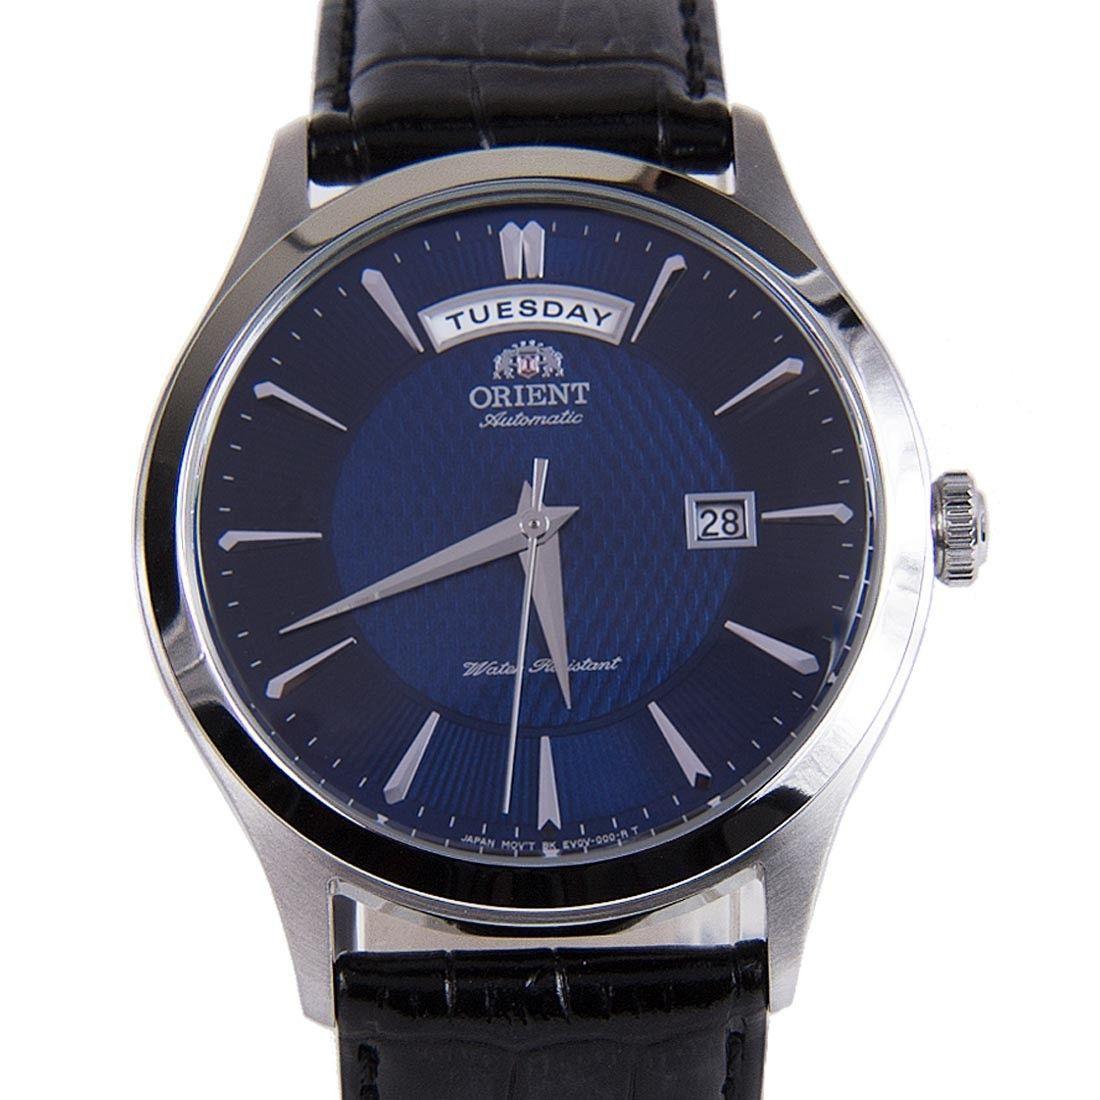 Mens Watch Raketa Black Dial 17 Jewels Mechanical Mens Dress Etsy Vintage Watches For Men Mens Dress Watches Watches For Men [ 2250 x 3000 Pixel ]